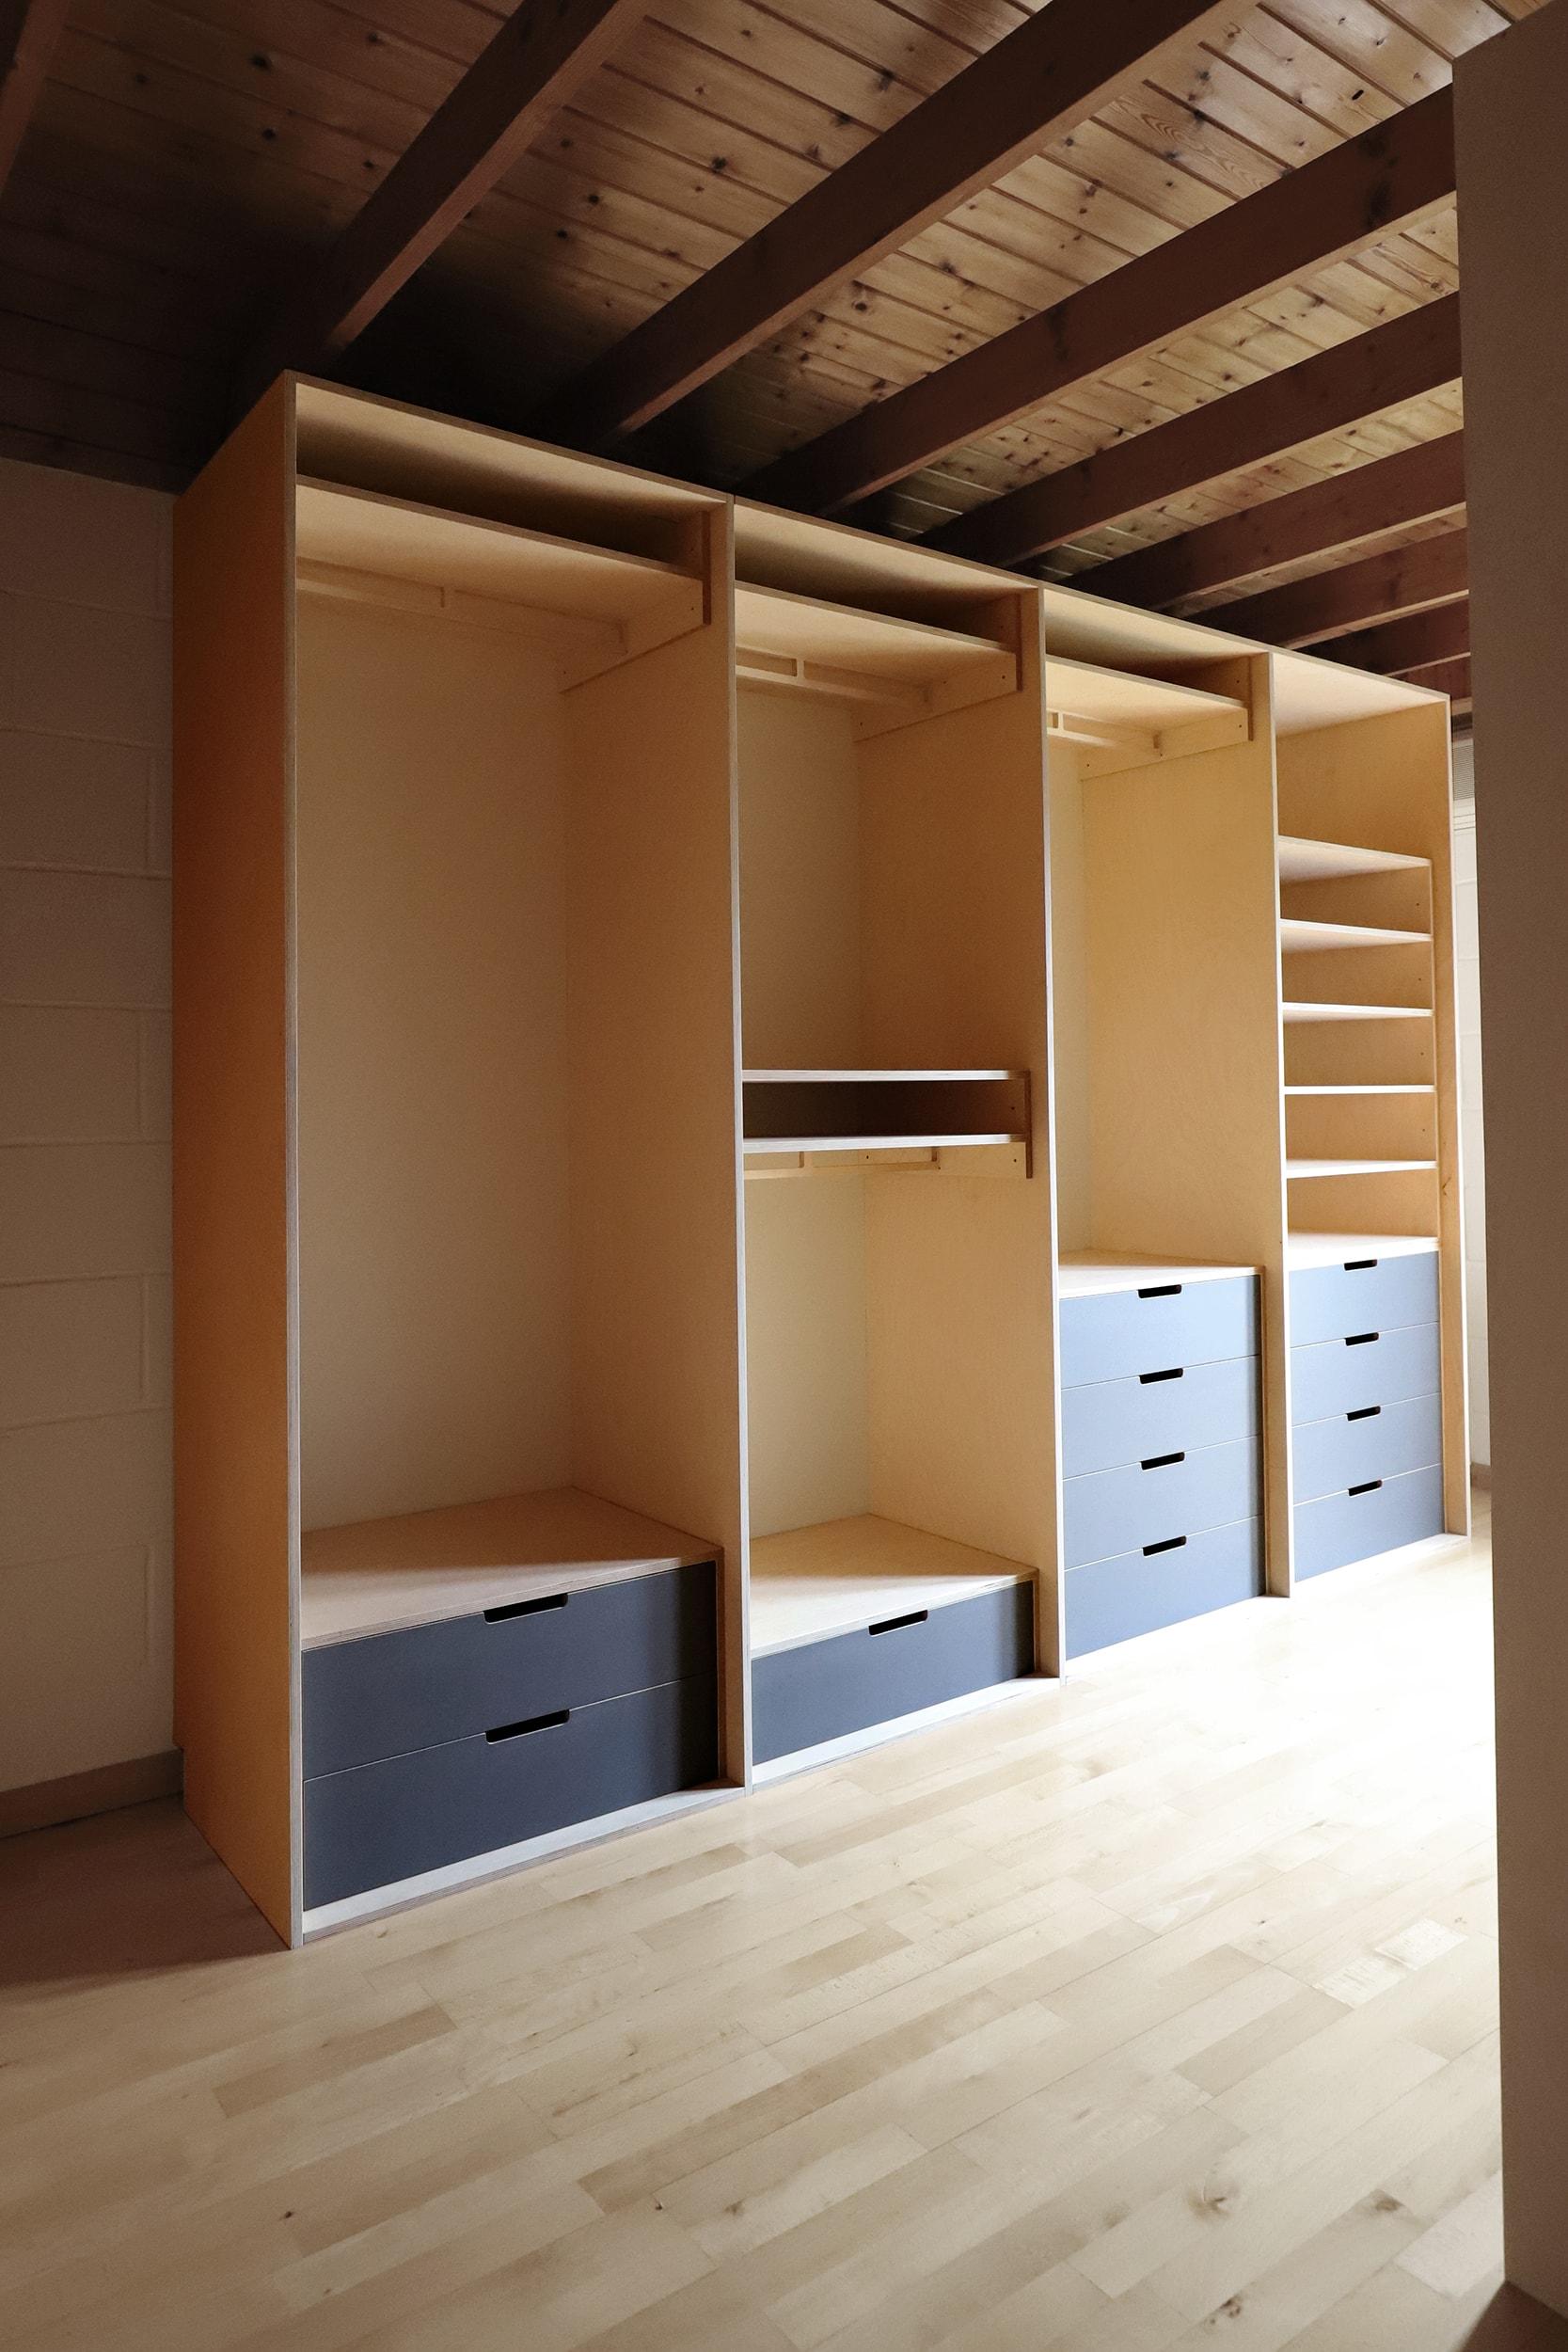 Samir's modern bespoke plywood walk in wardrobe by Lozi in his home in Bexley